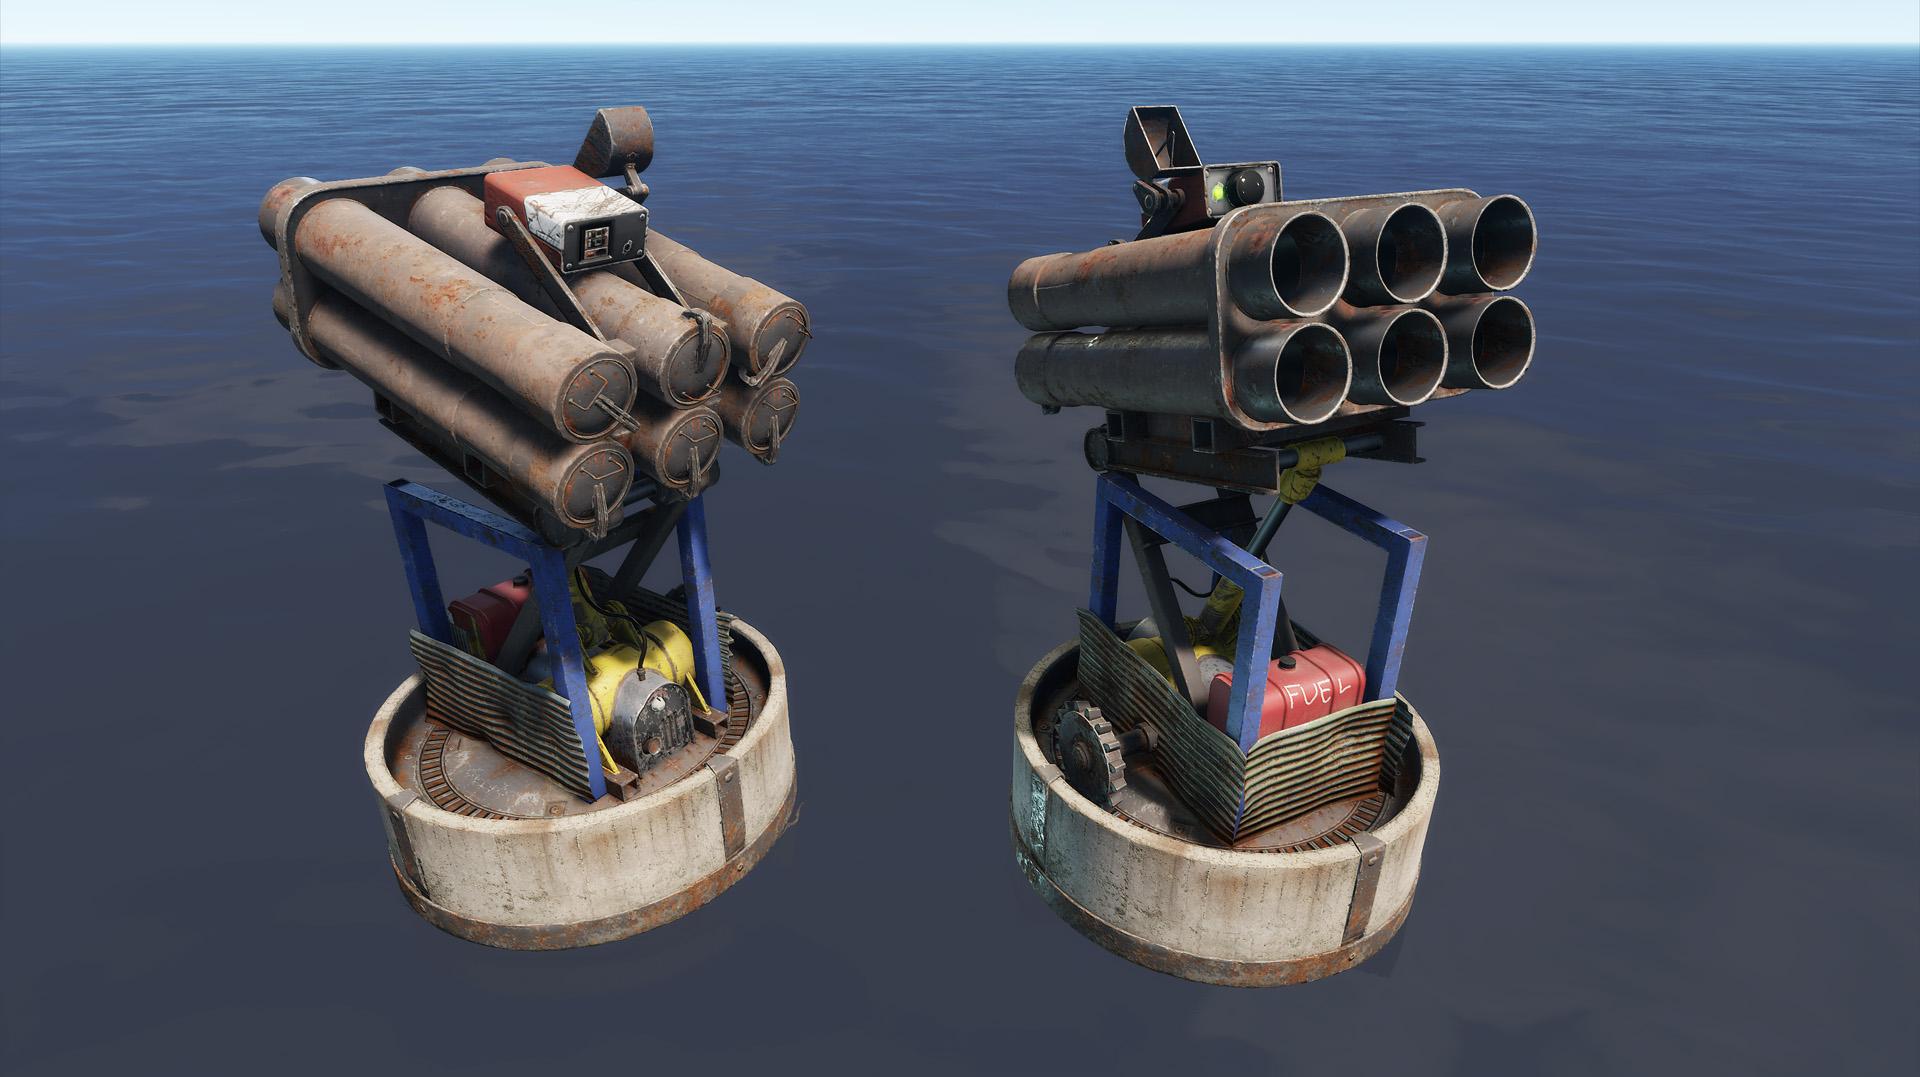 The_Cargo_Ship_Update_30.jpg